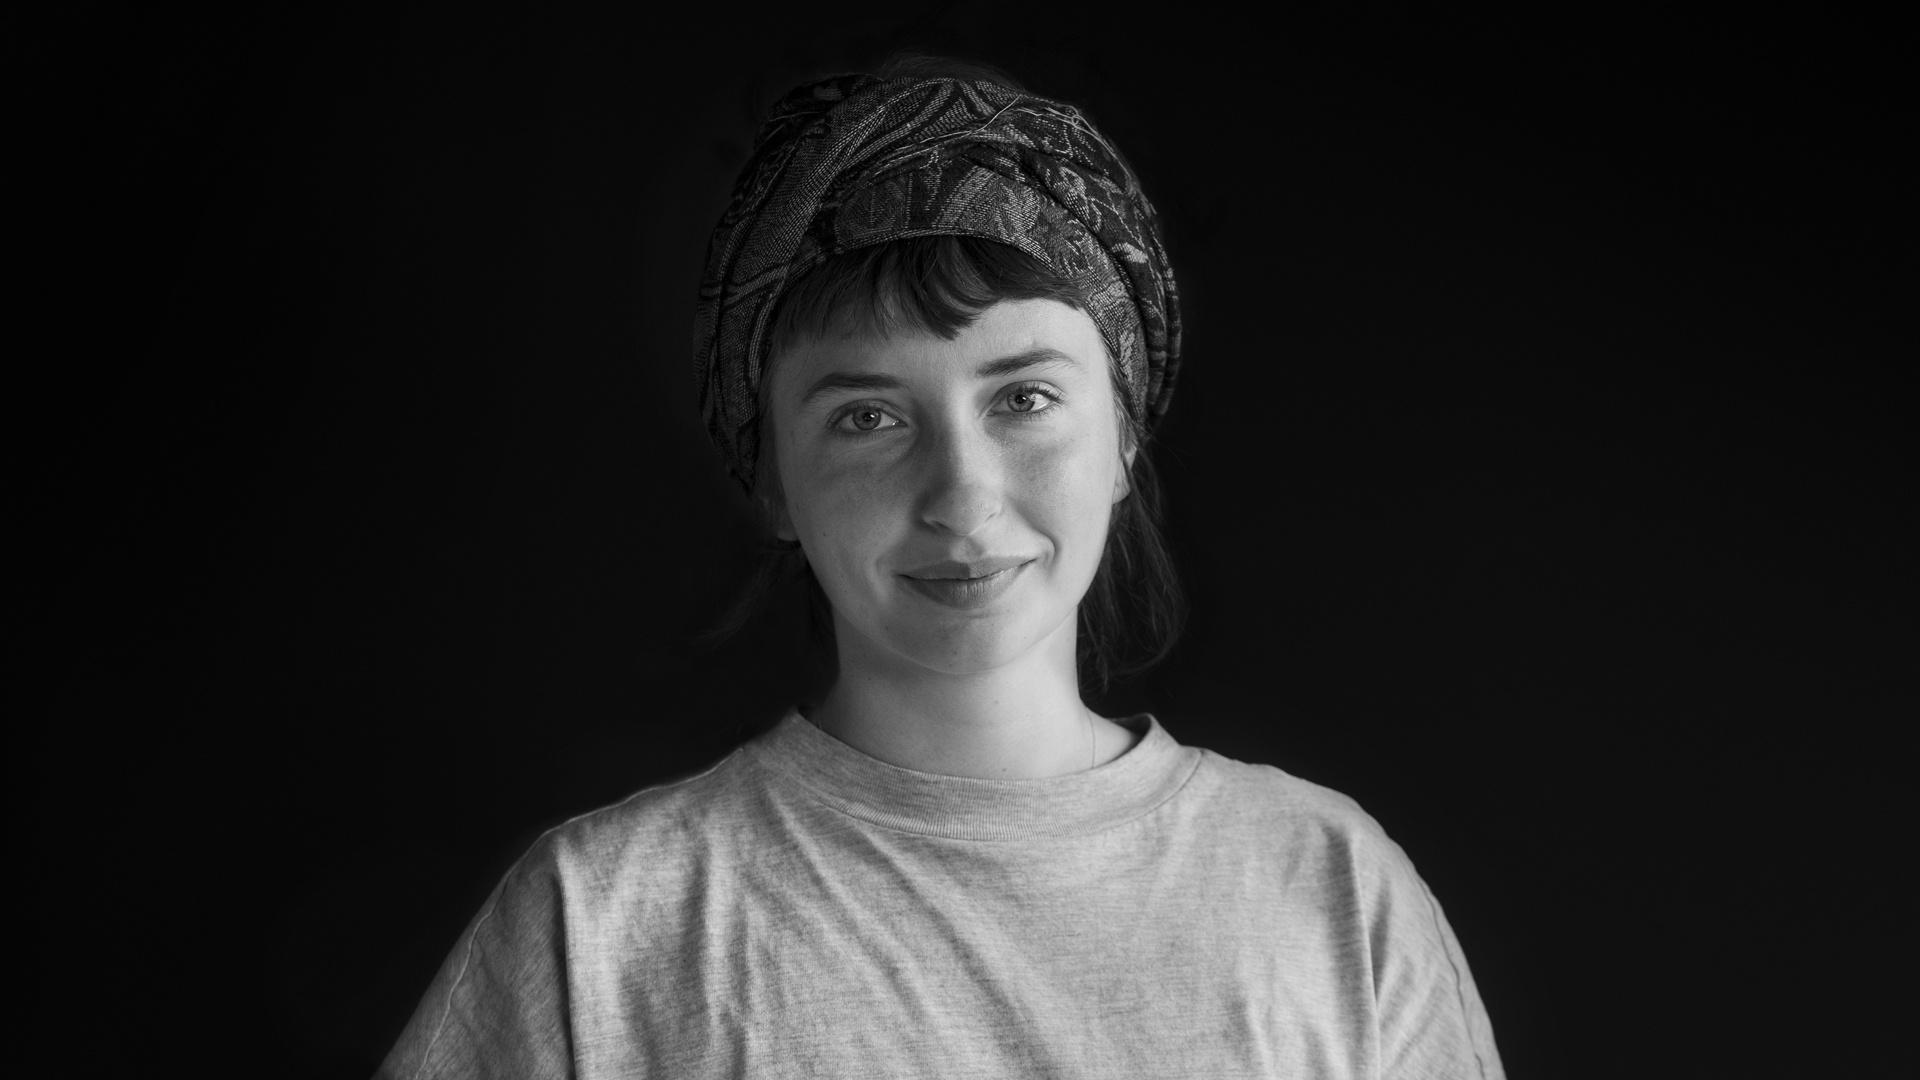 Sarah Newrzella